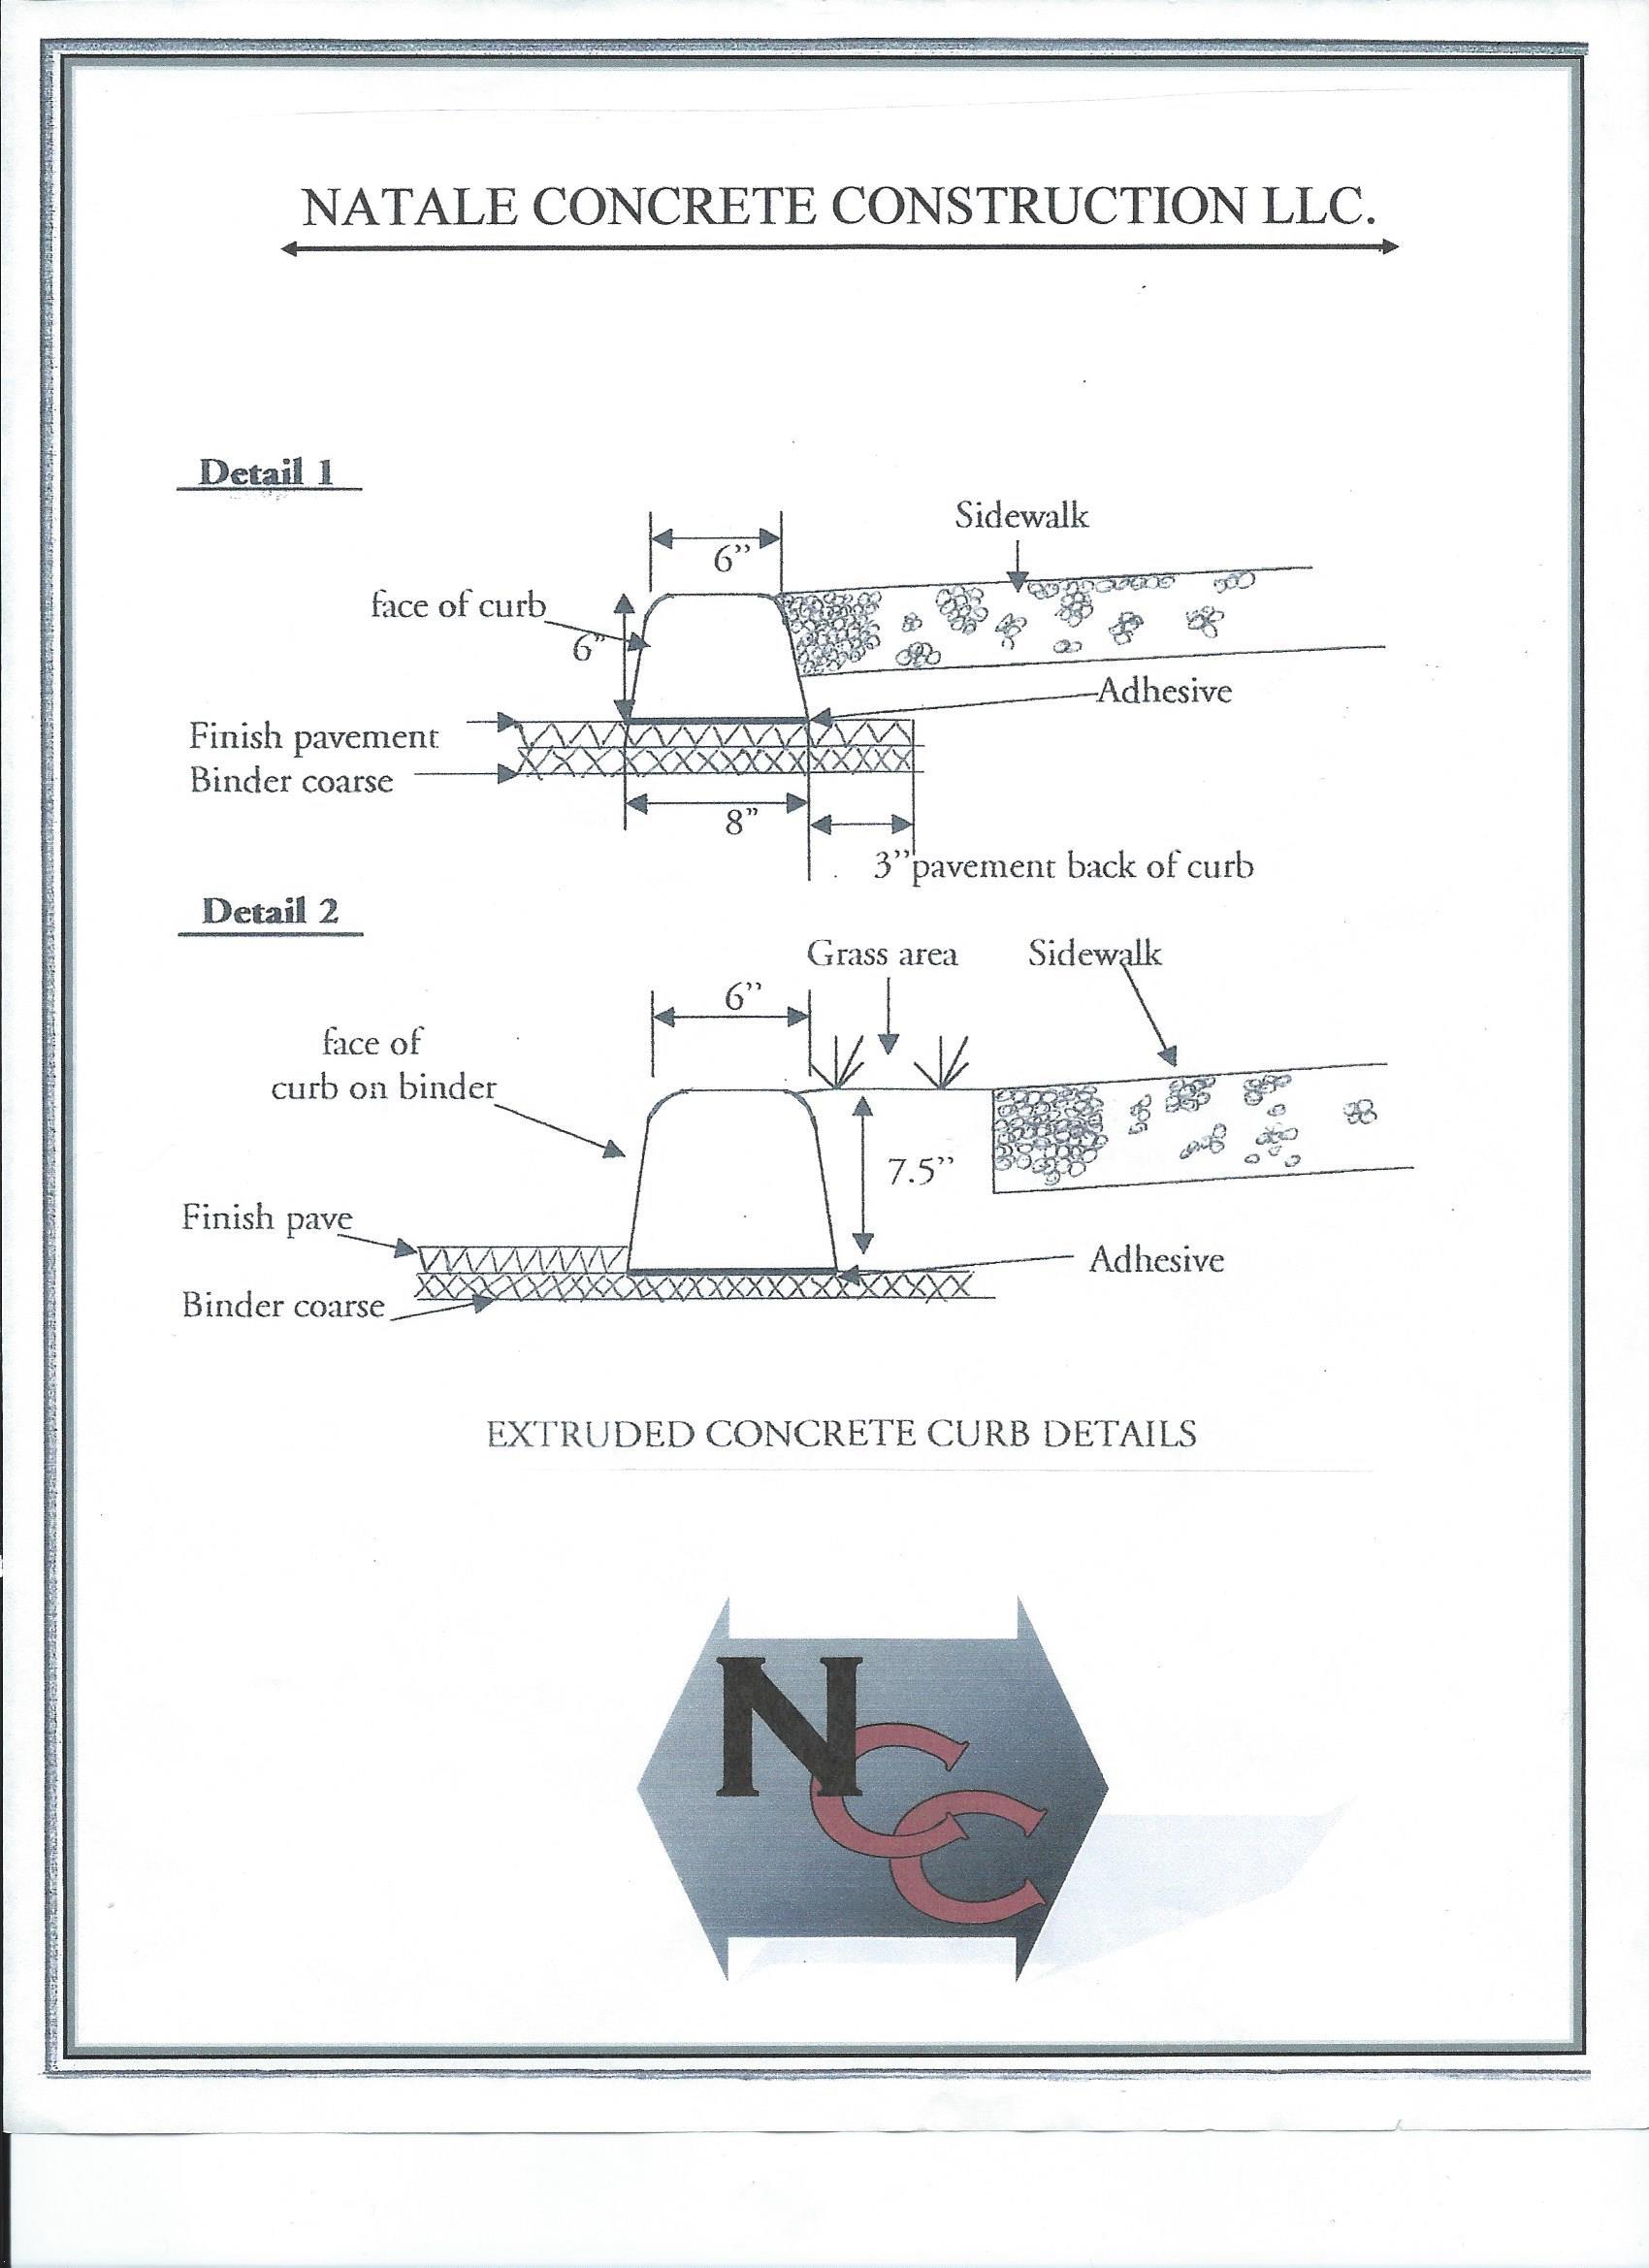 Natale Concrete Construction Llc Video Amp Image Gallery